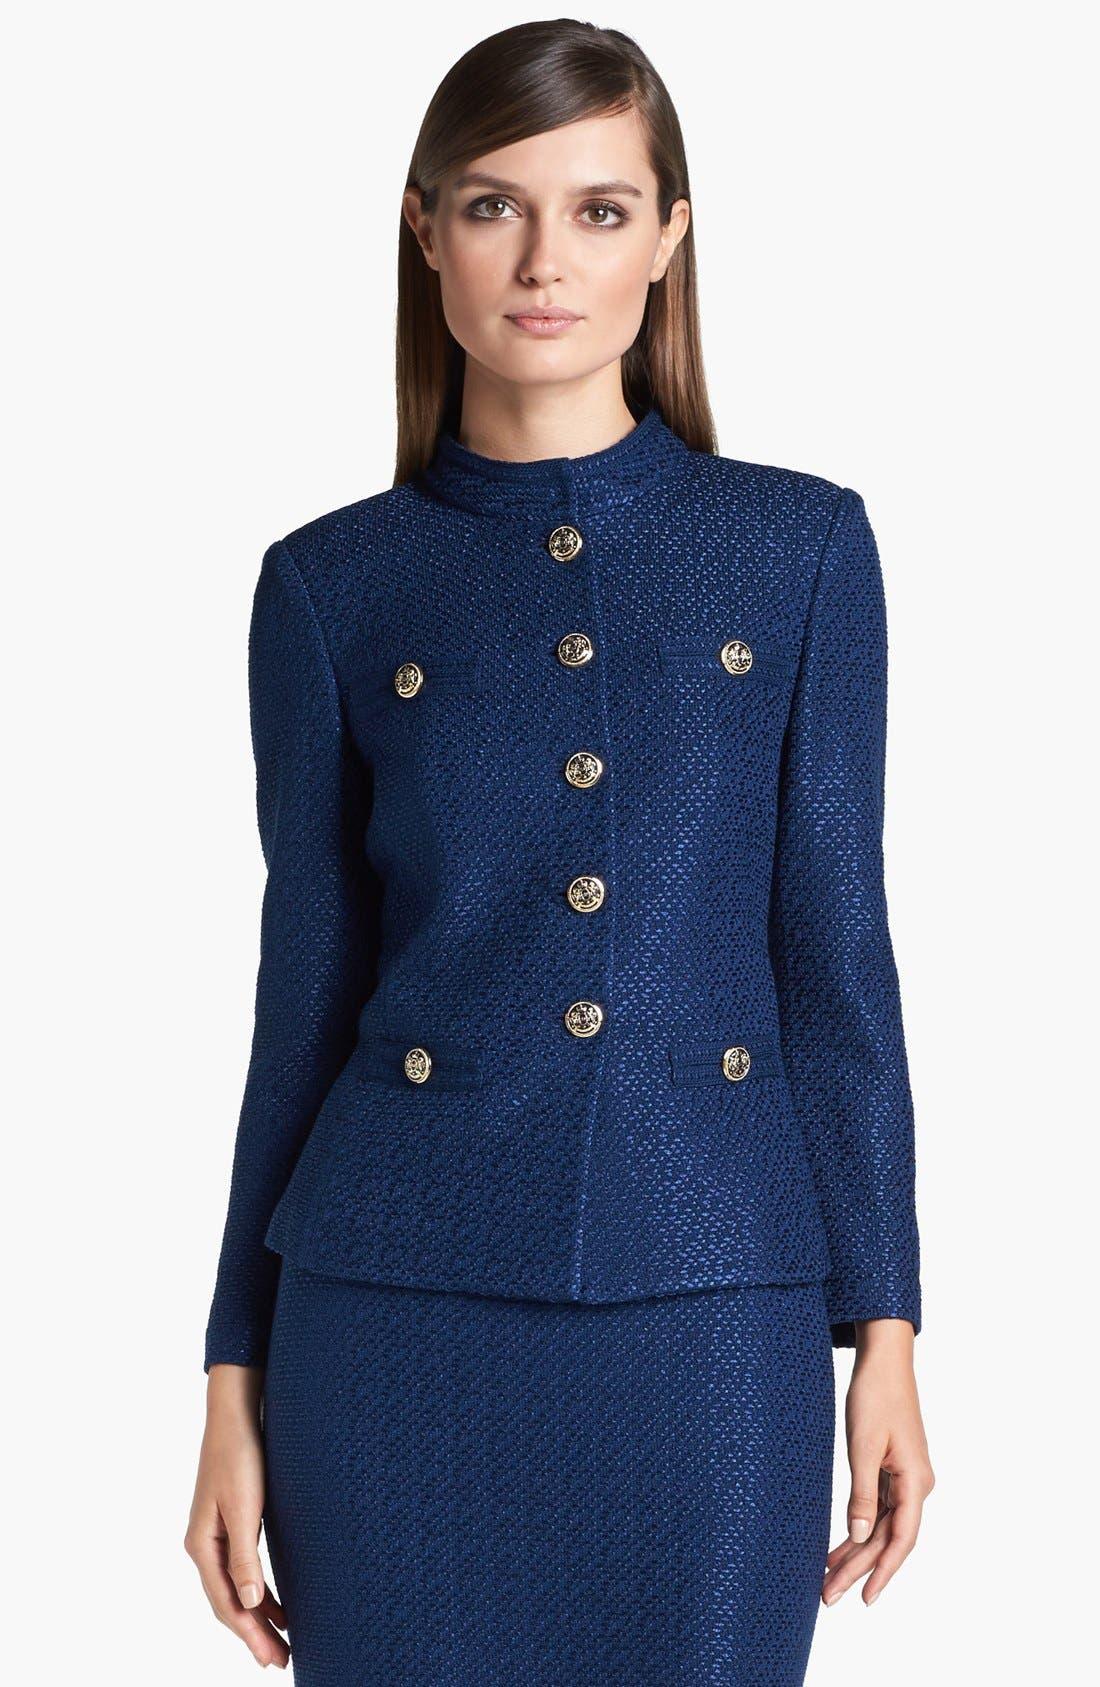 Alternate Image 1 Selected - St. John Collection Stand Collar Tonal Dot Knit Jacket